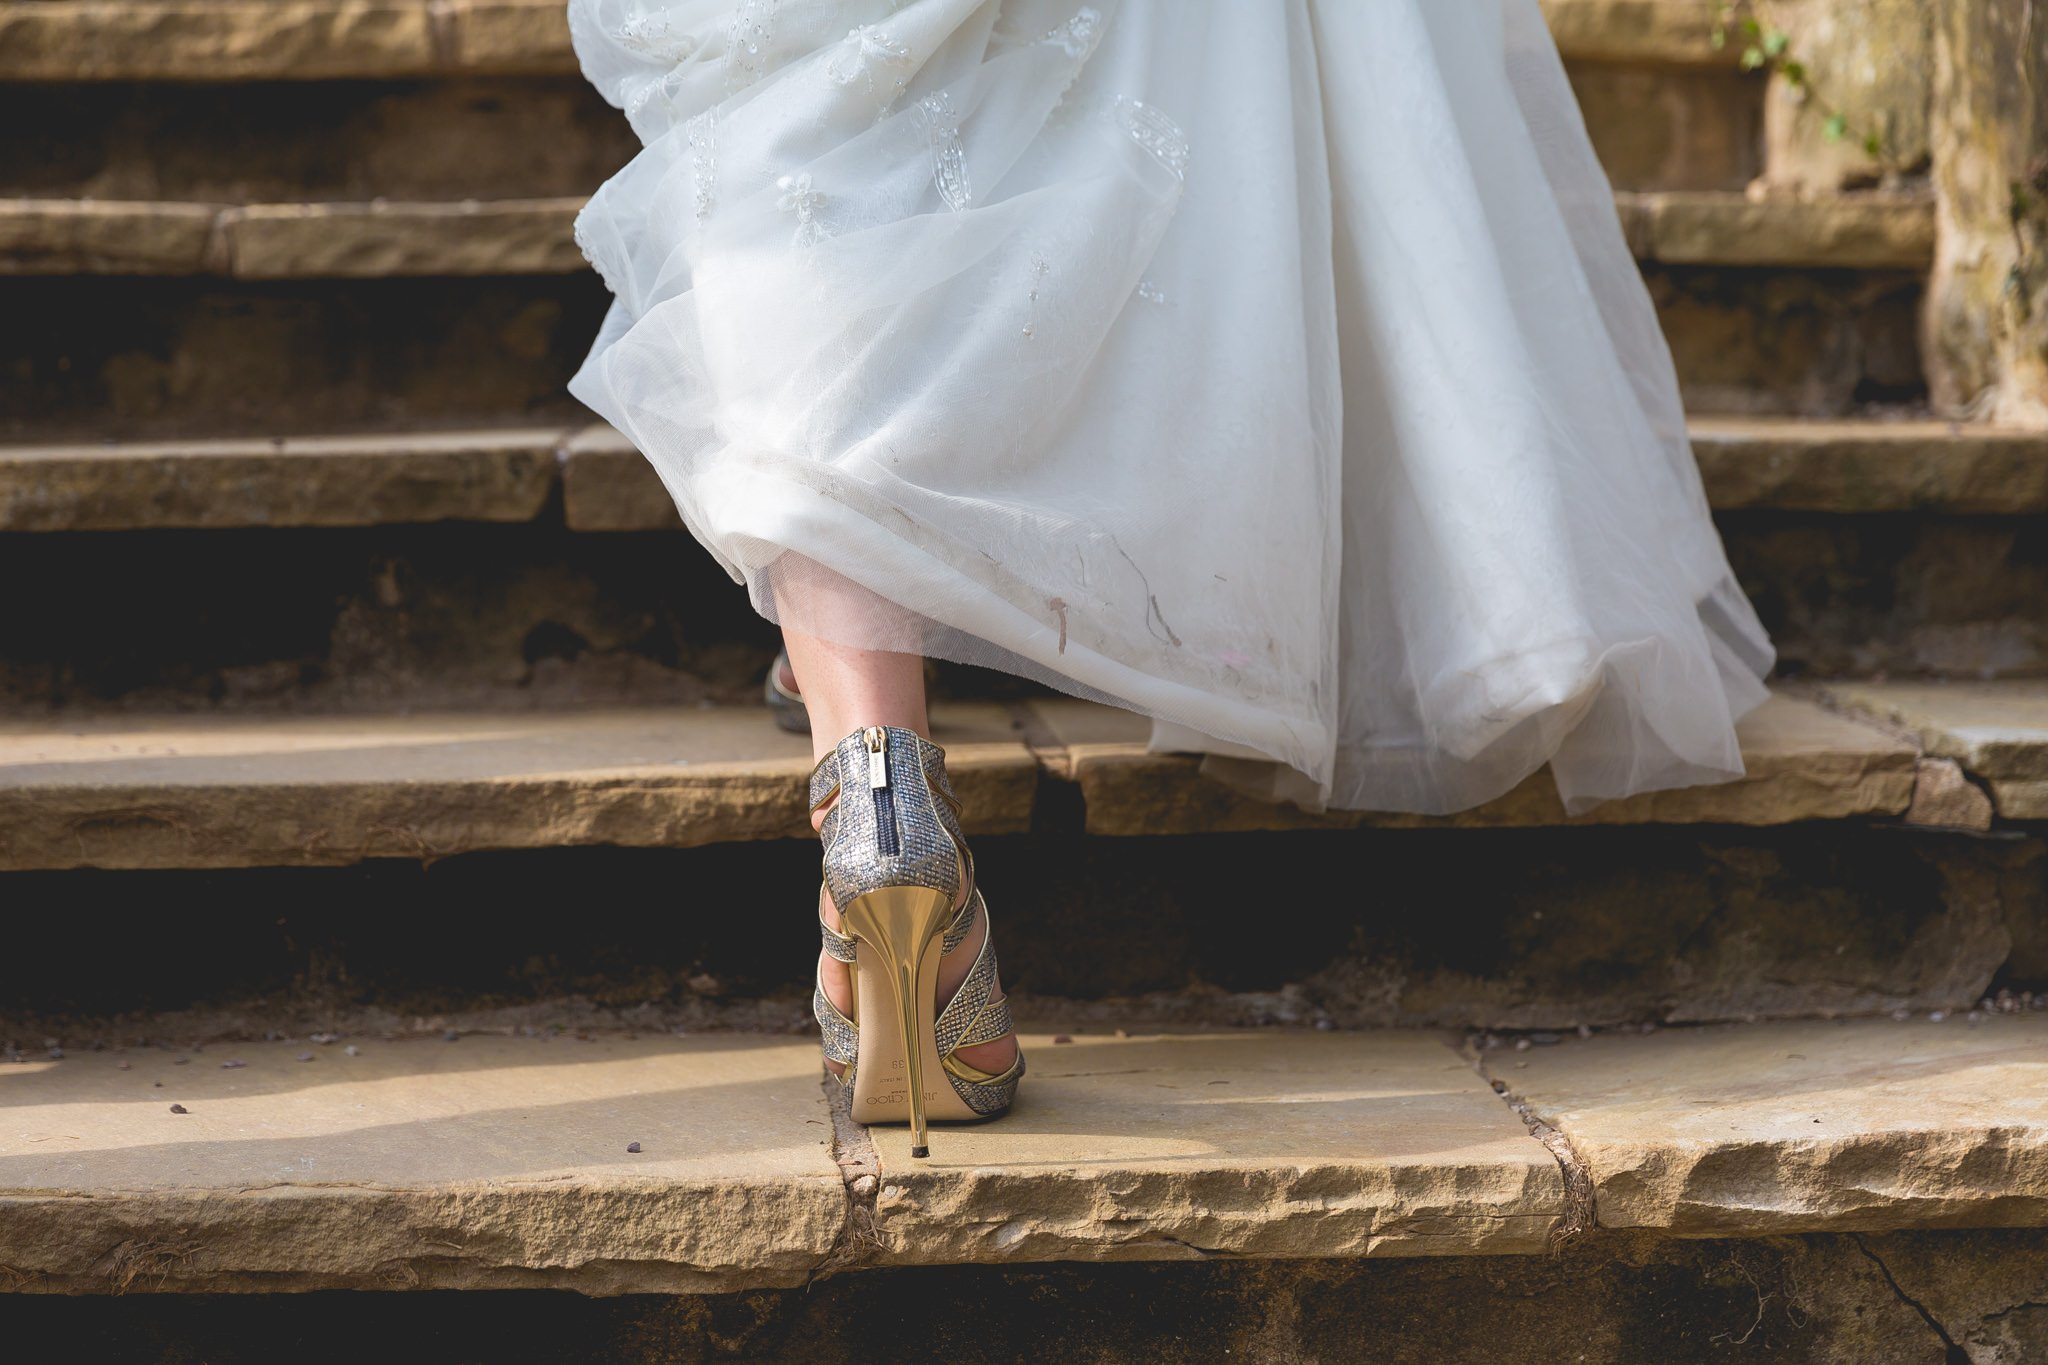 Luxury Jimmy Choo wedding shoes